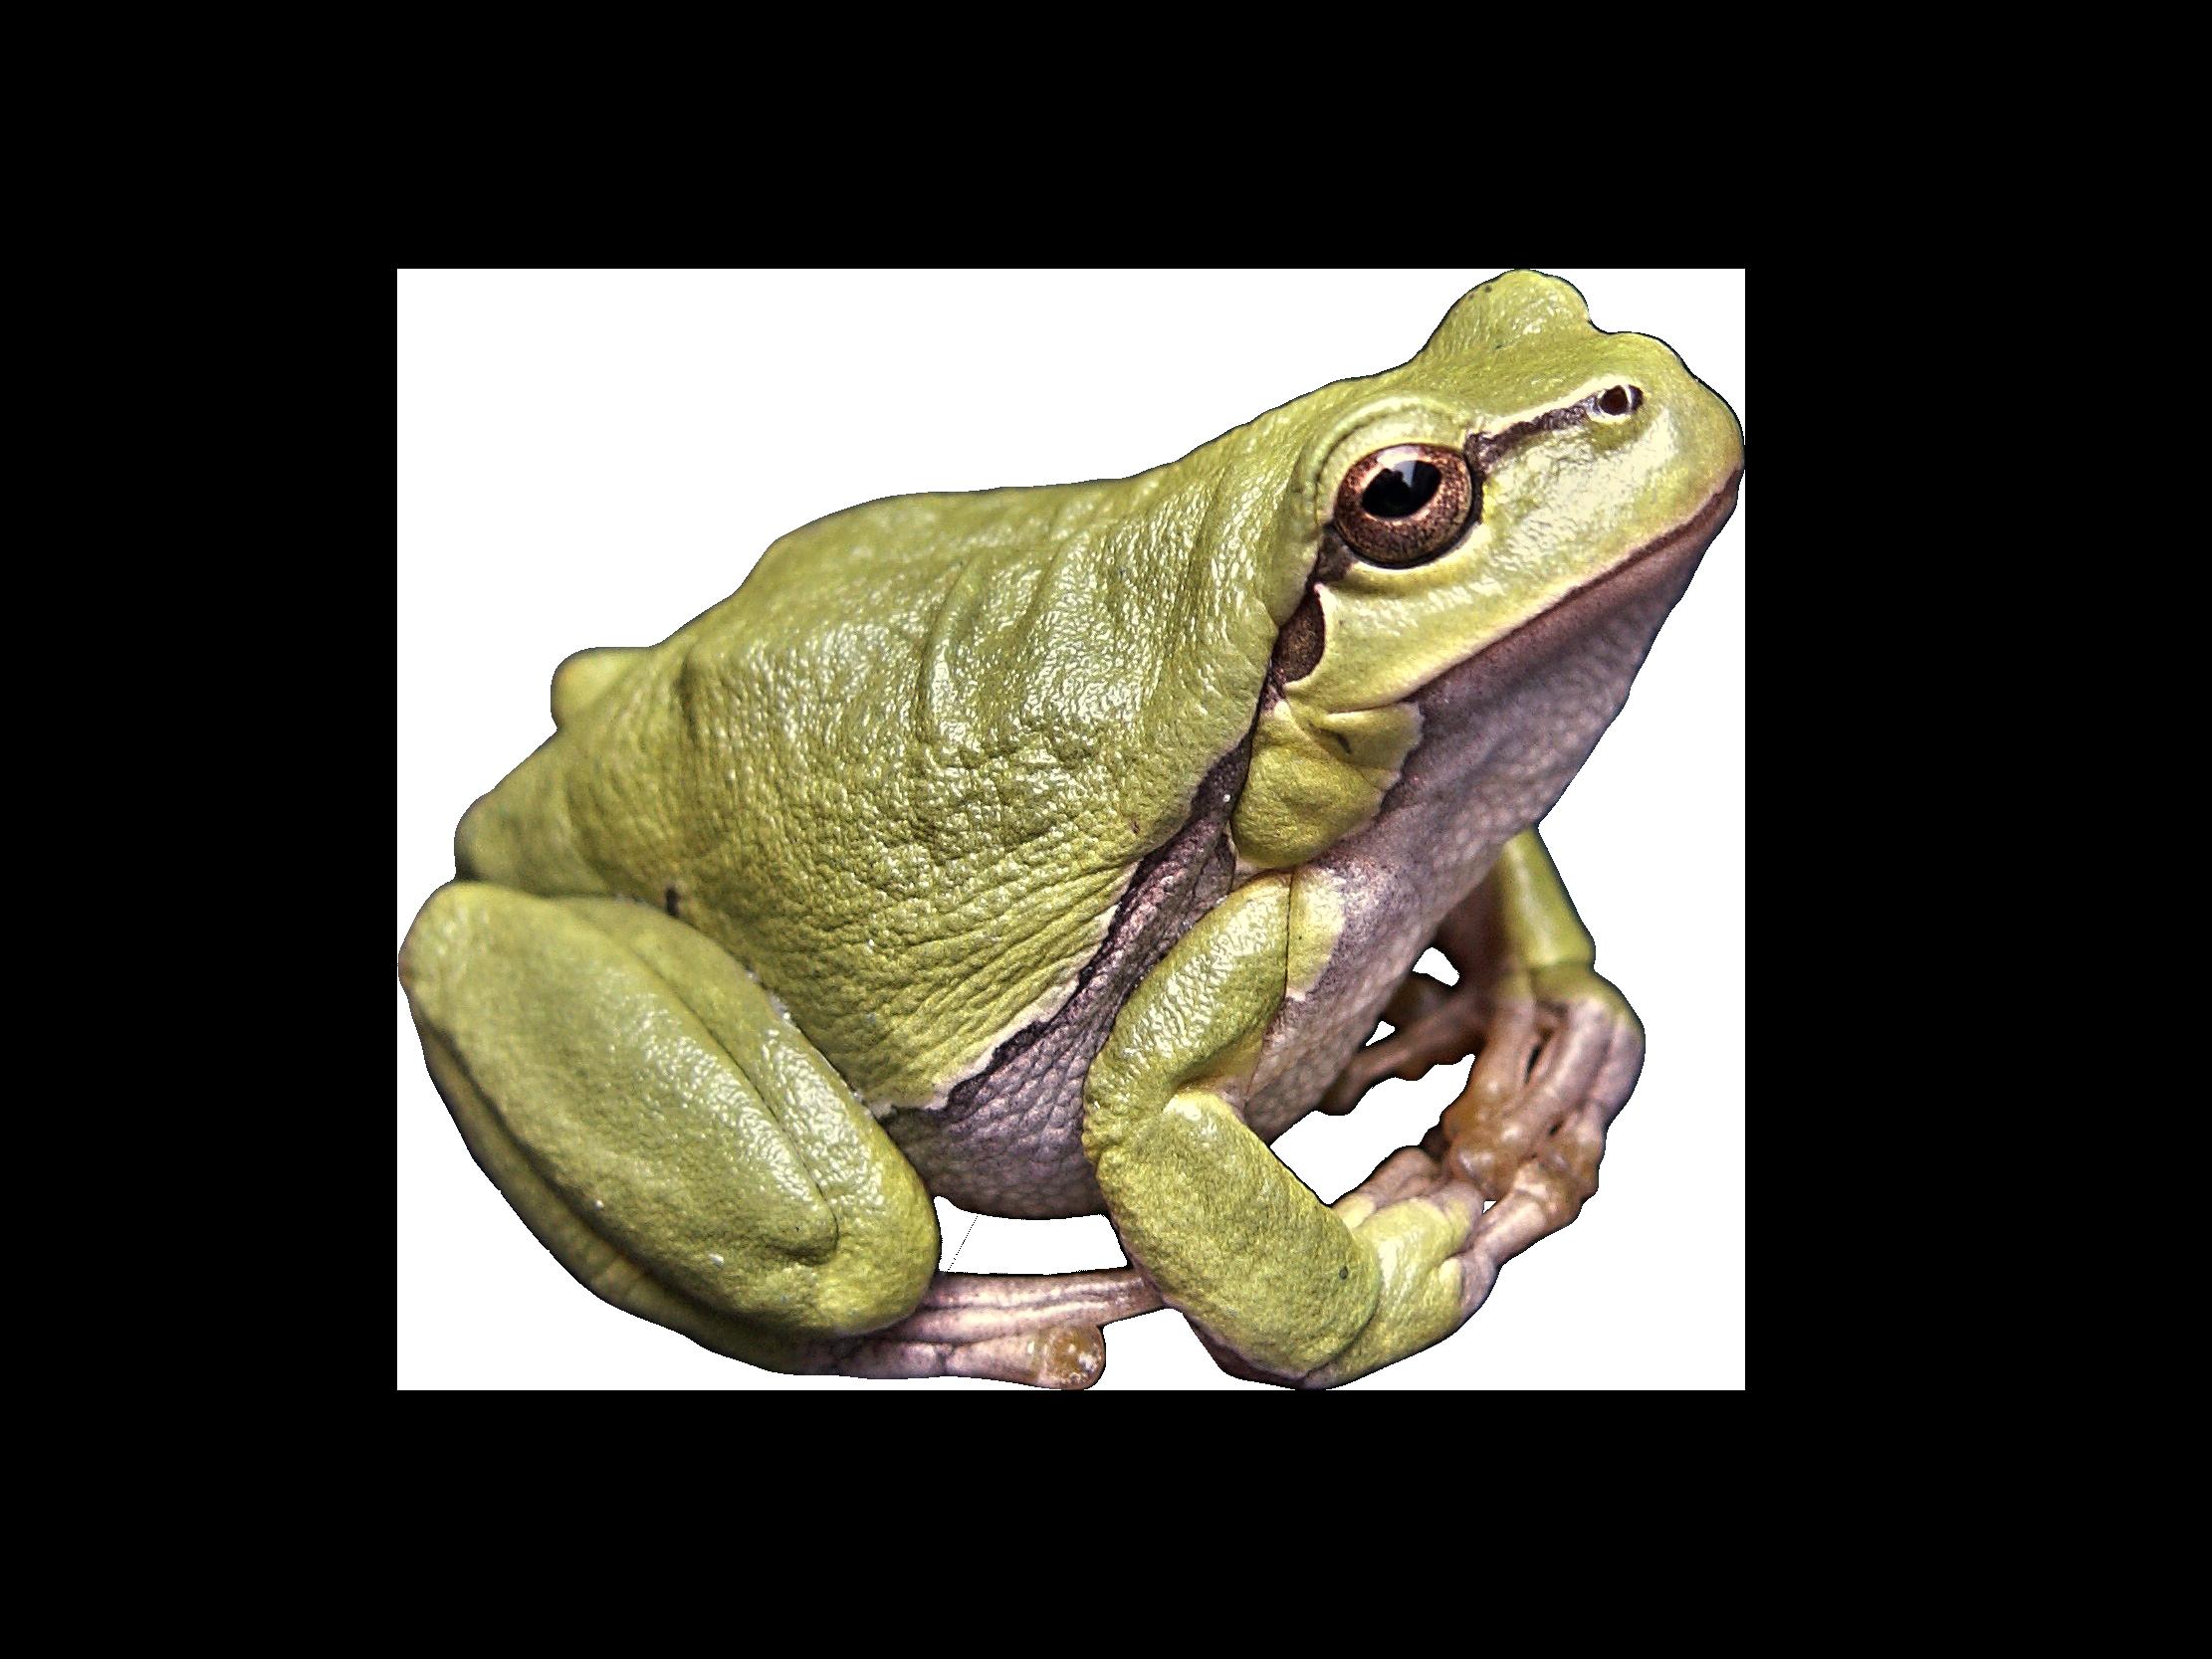 Frog Green PNG Image